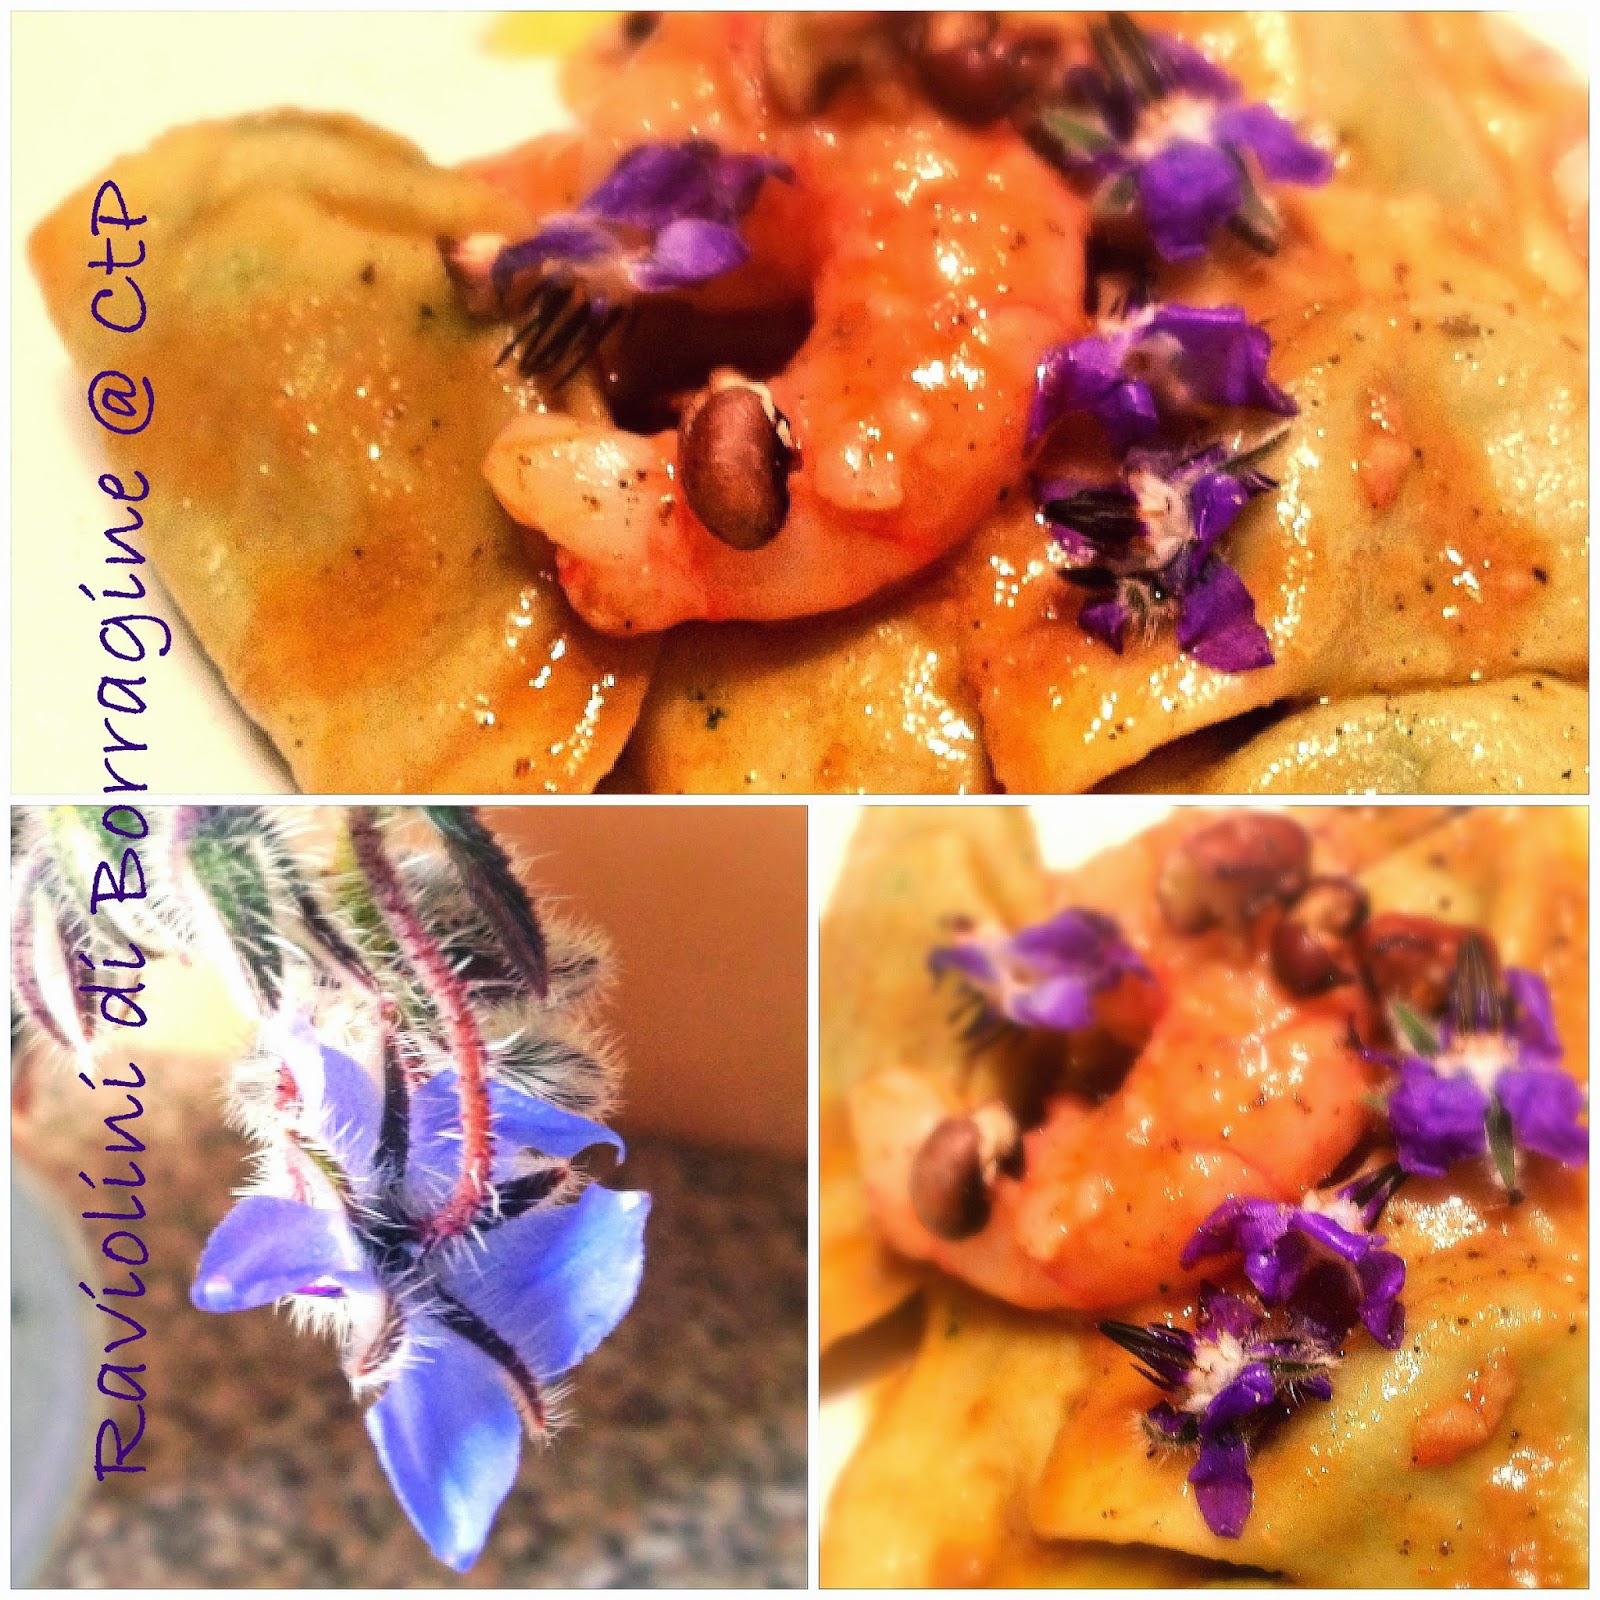 ravioli borragine gamberi rossi e fagiolina del trasimento oresidio slowfood